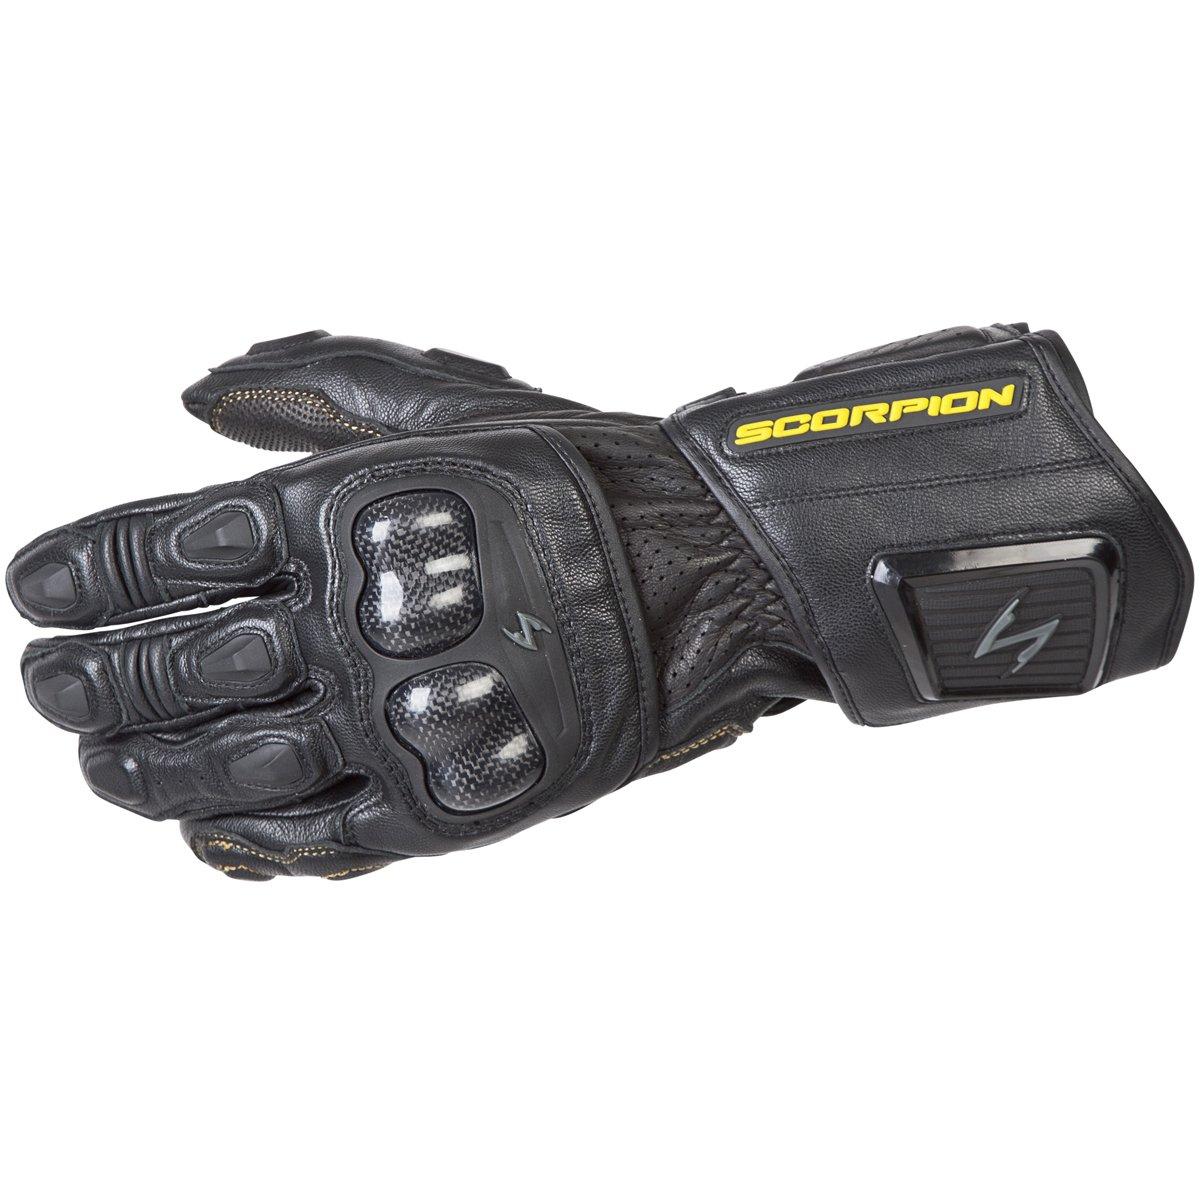 ScorpionExo SG3 MKII Men's Long Gauntlet Sport Gloves (Black, Large)